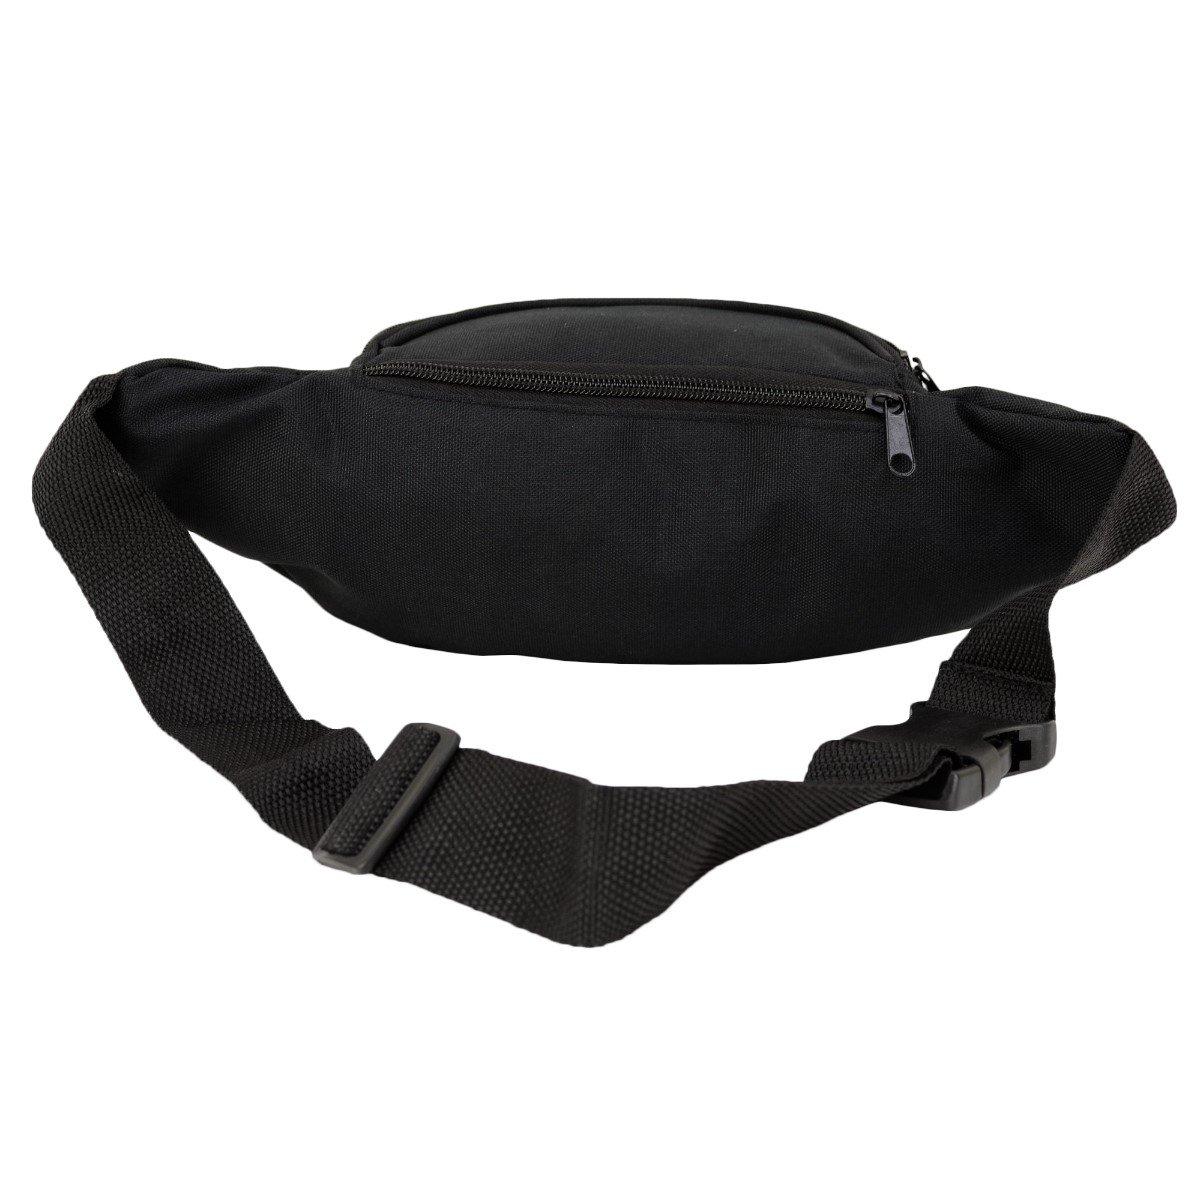 Einheitsgr/össe Lonsdale London G/ürteltasche Bumbag Hip Bag schwarz grau